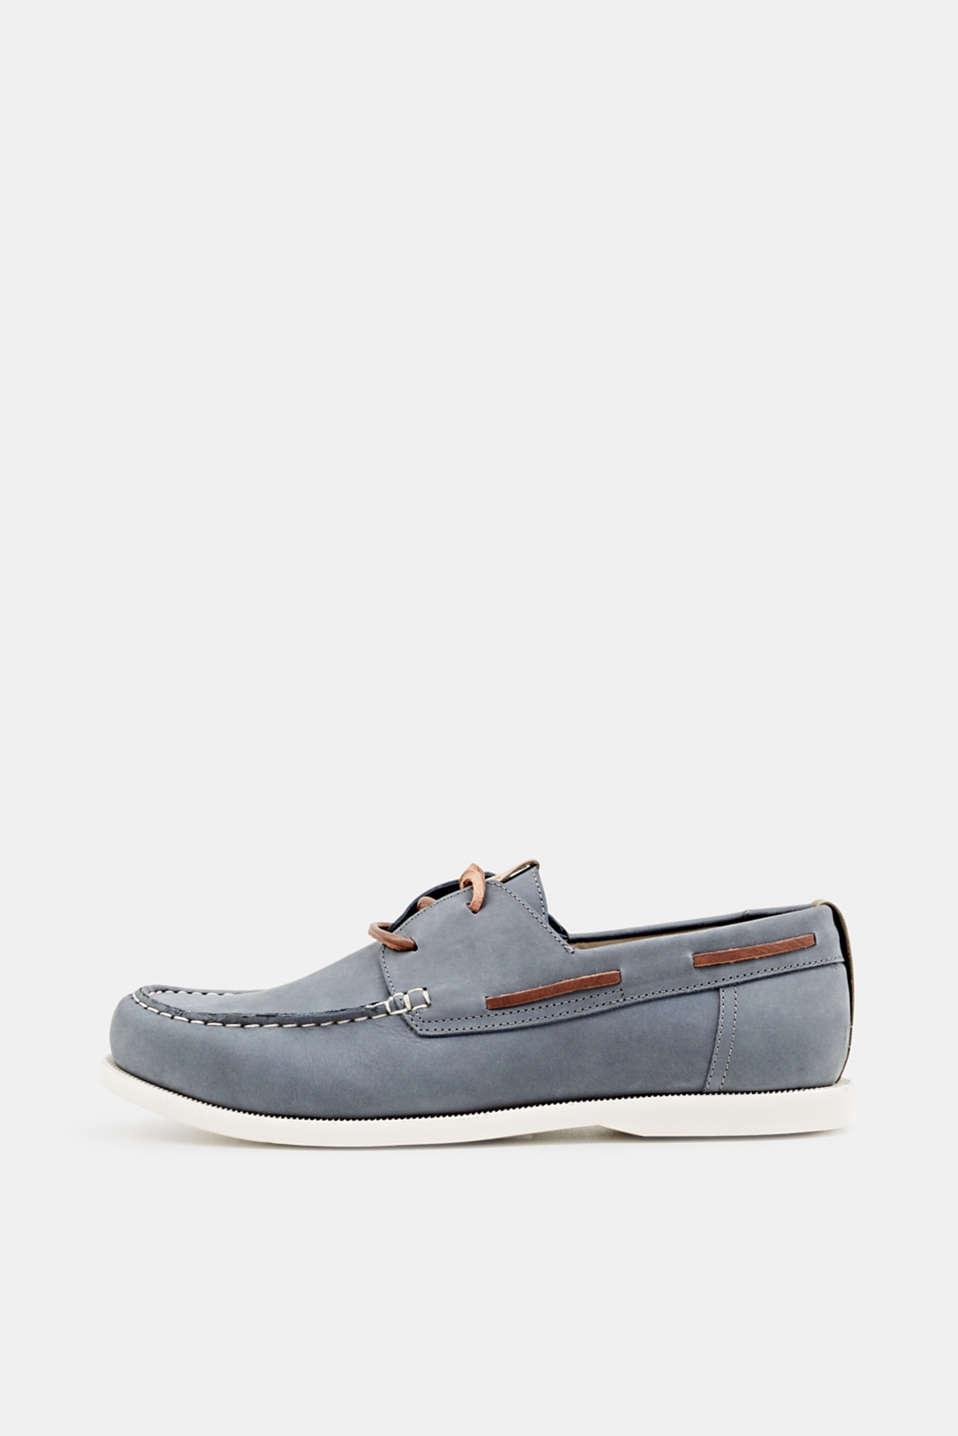 Leather boat shoes, LIGHT BLUE, detail image number 0